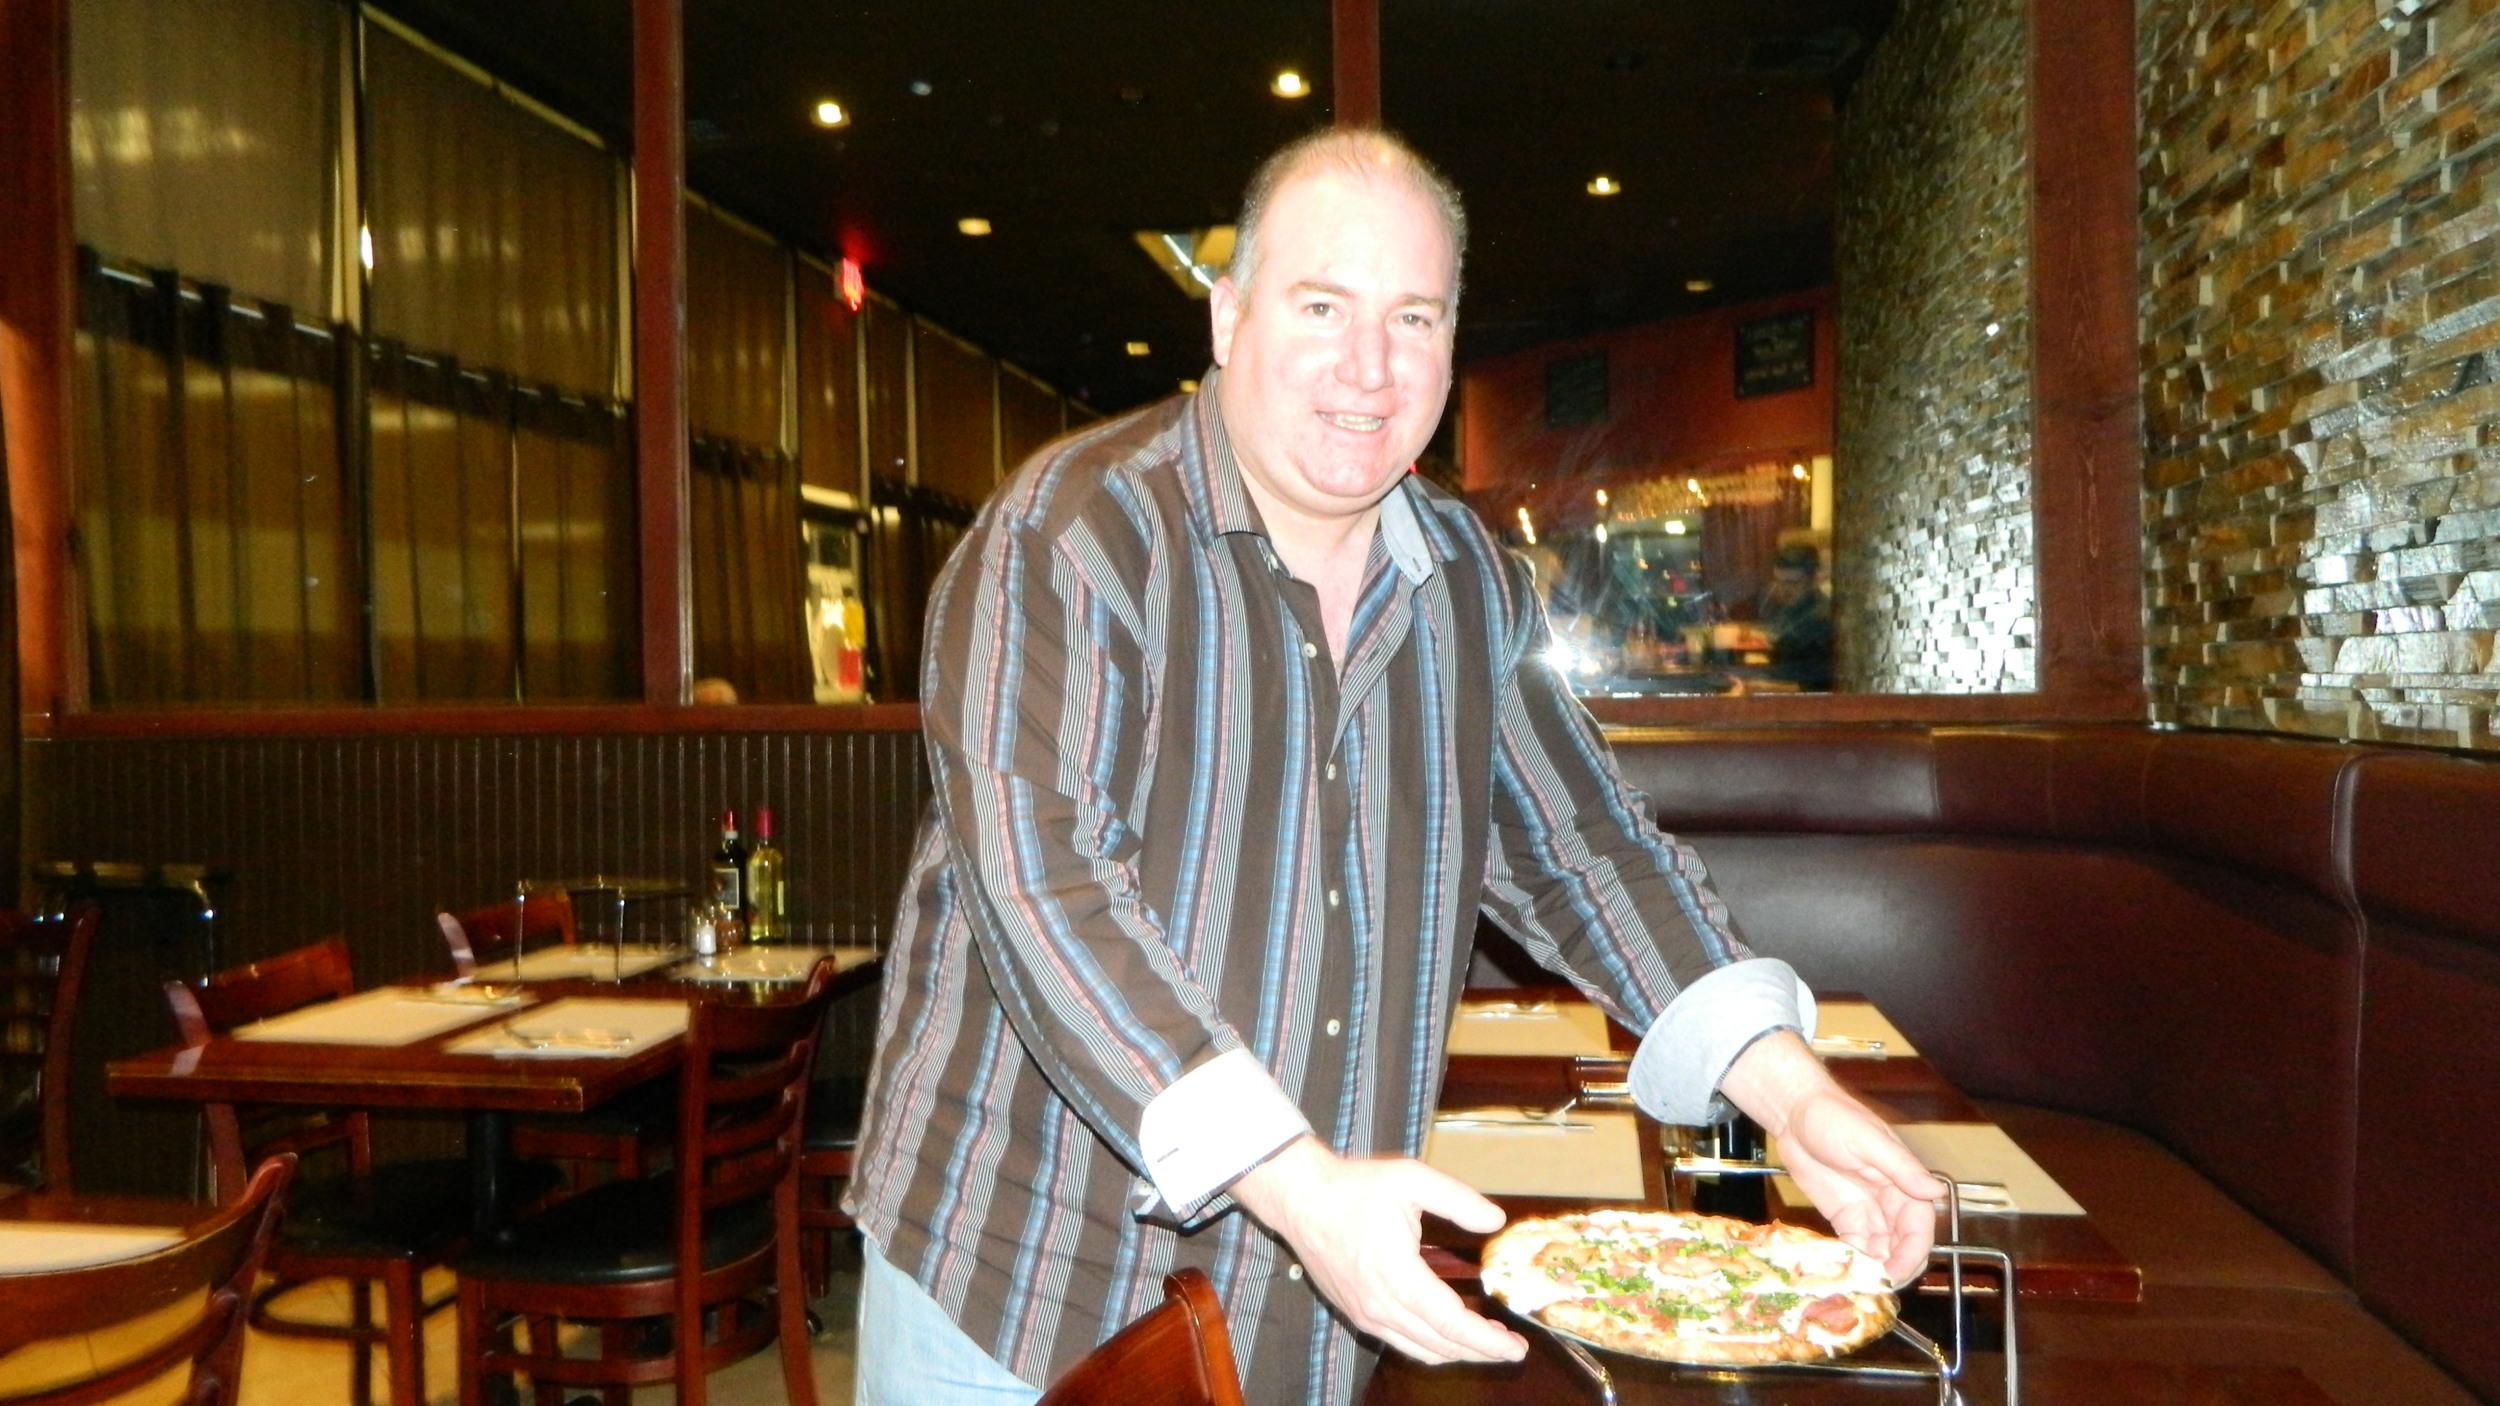 Owner Bill Massa opened his 345 Main St., Huntington pizzeria on Jan. 31, 2014.